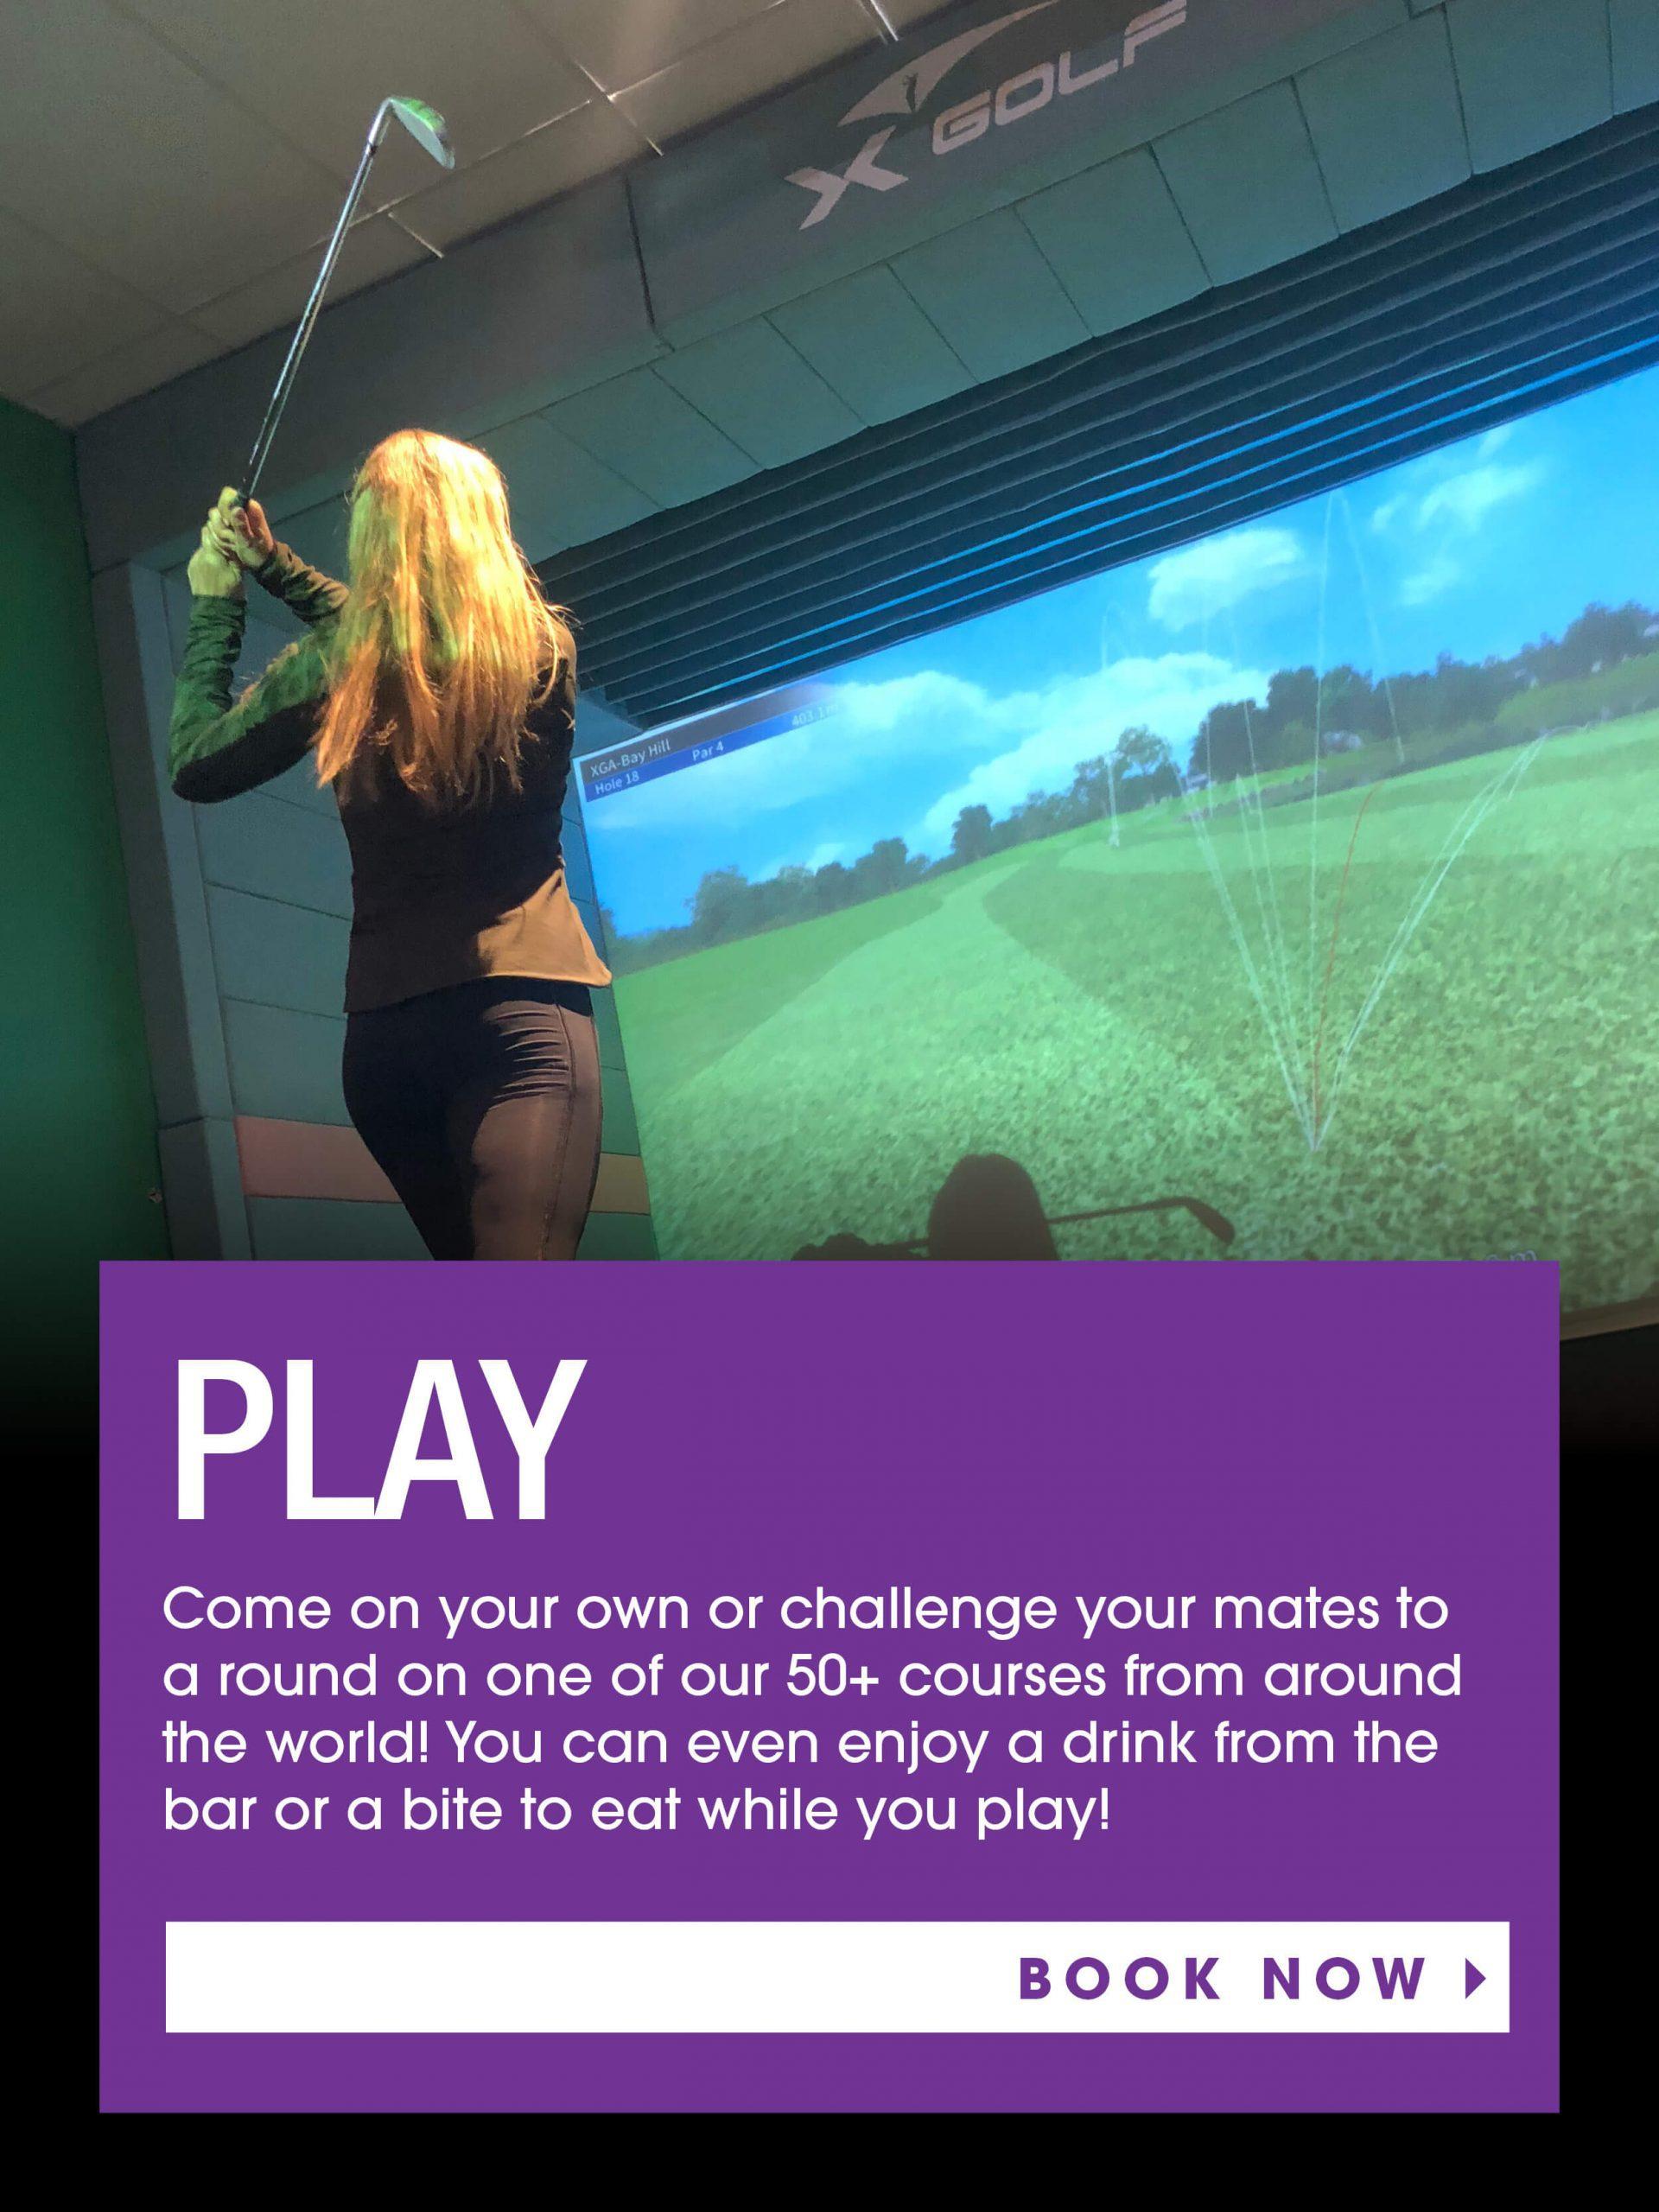 X-Golf Simulators Book Now